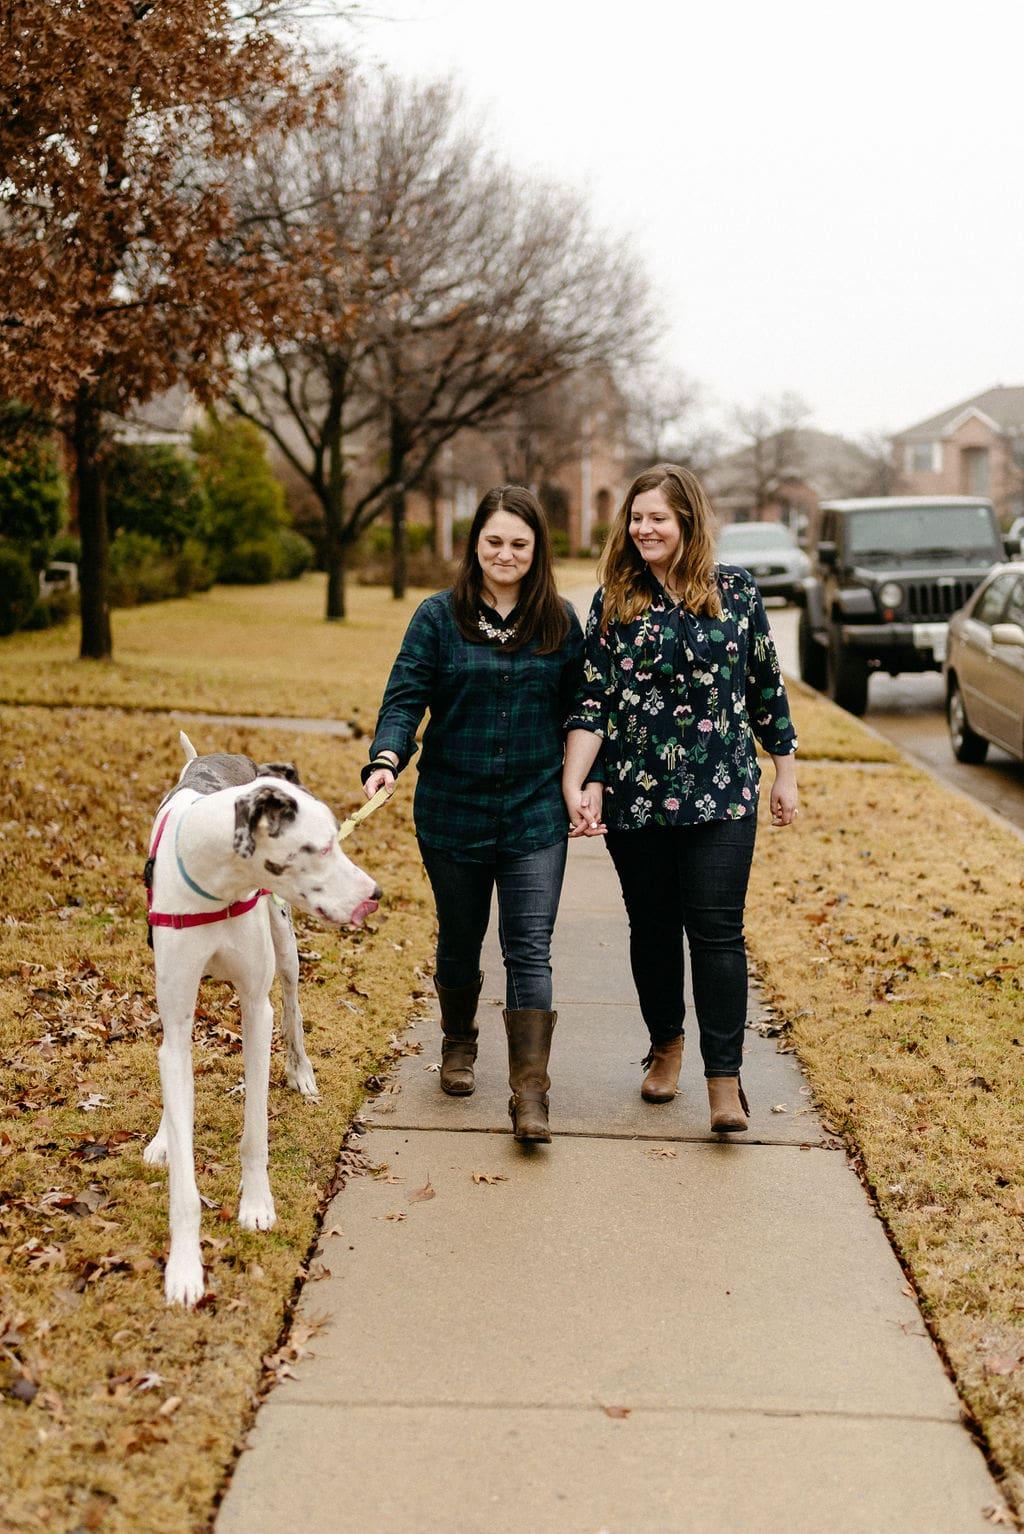 Married LGBTQ Couple walks their great dane